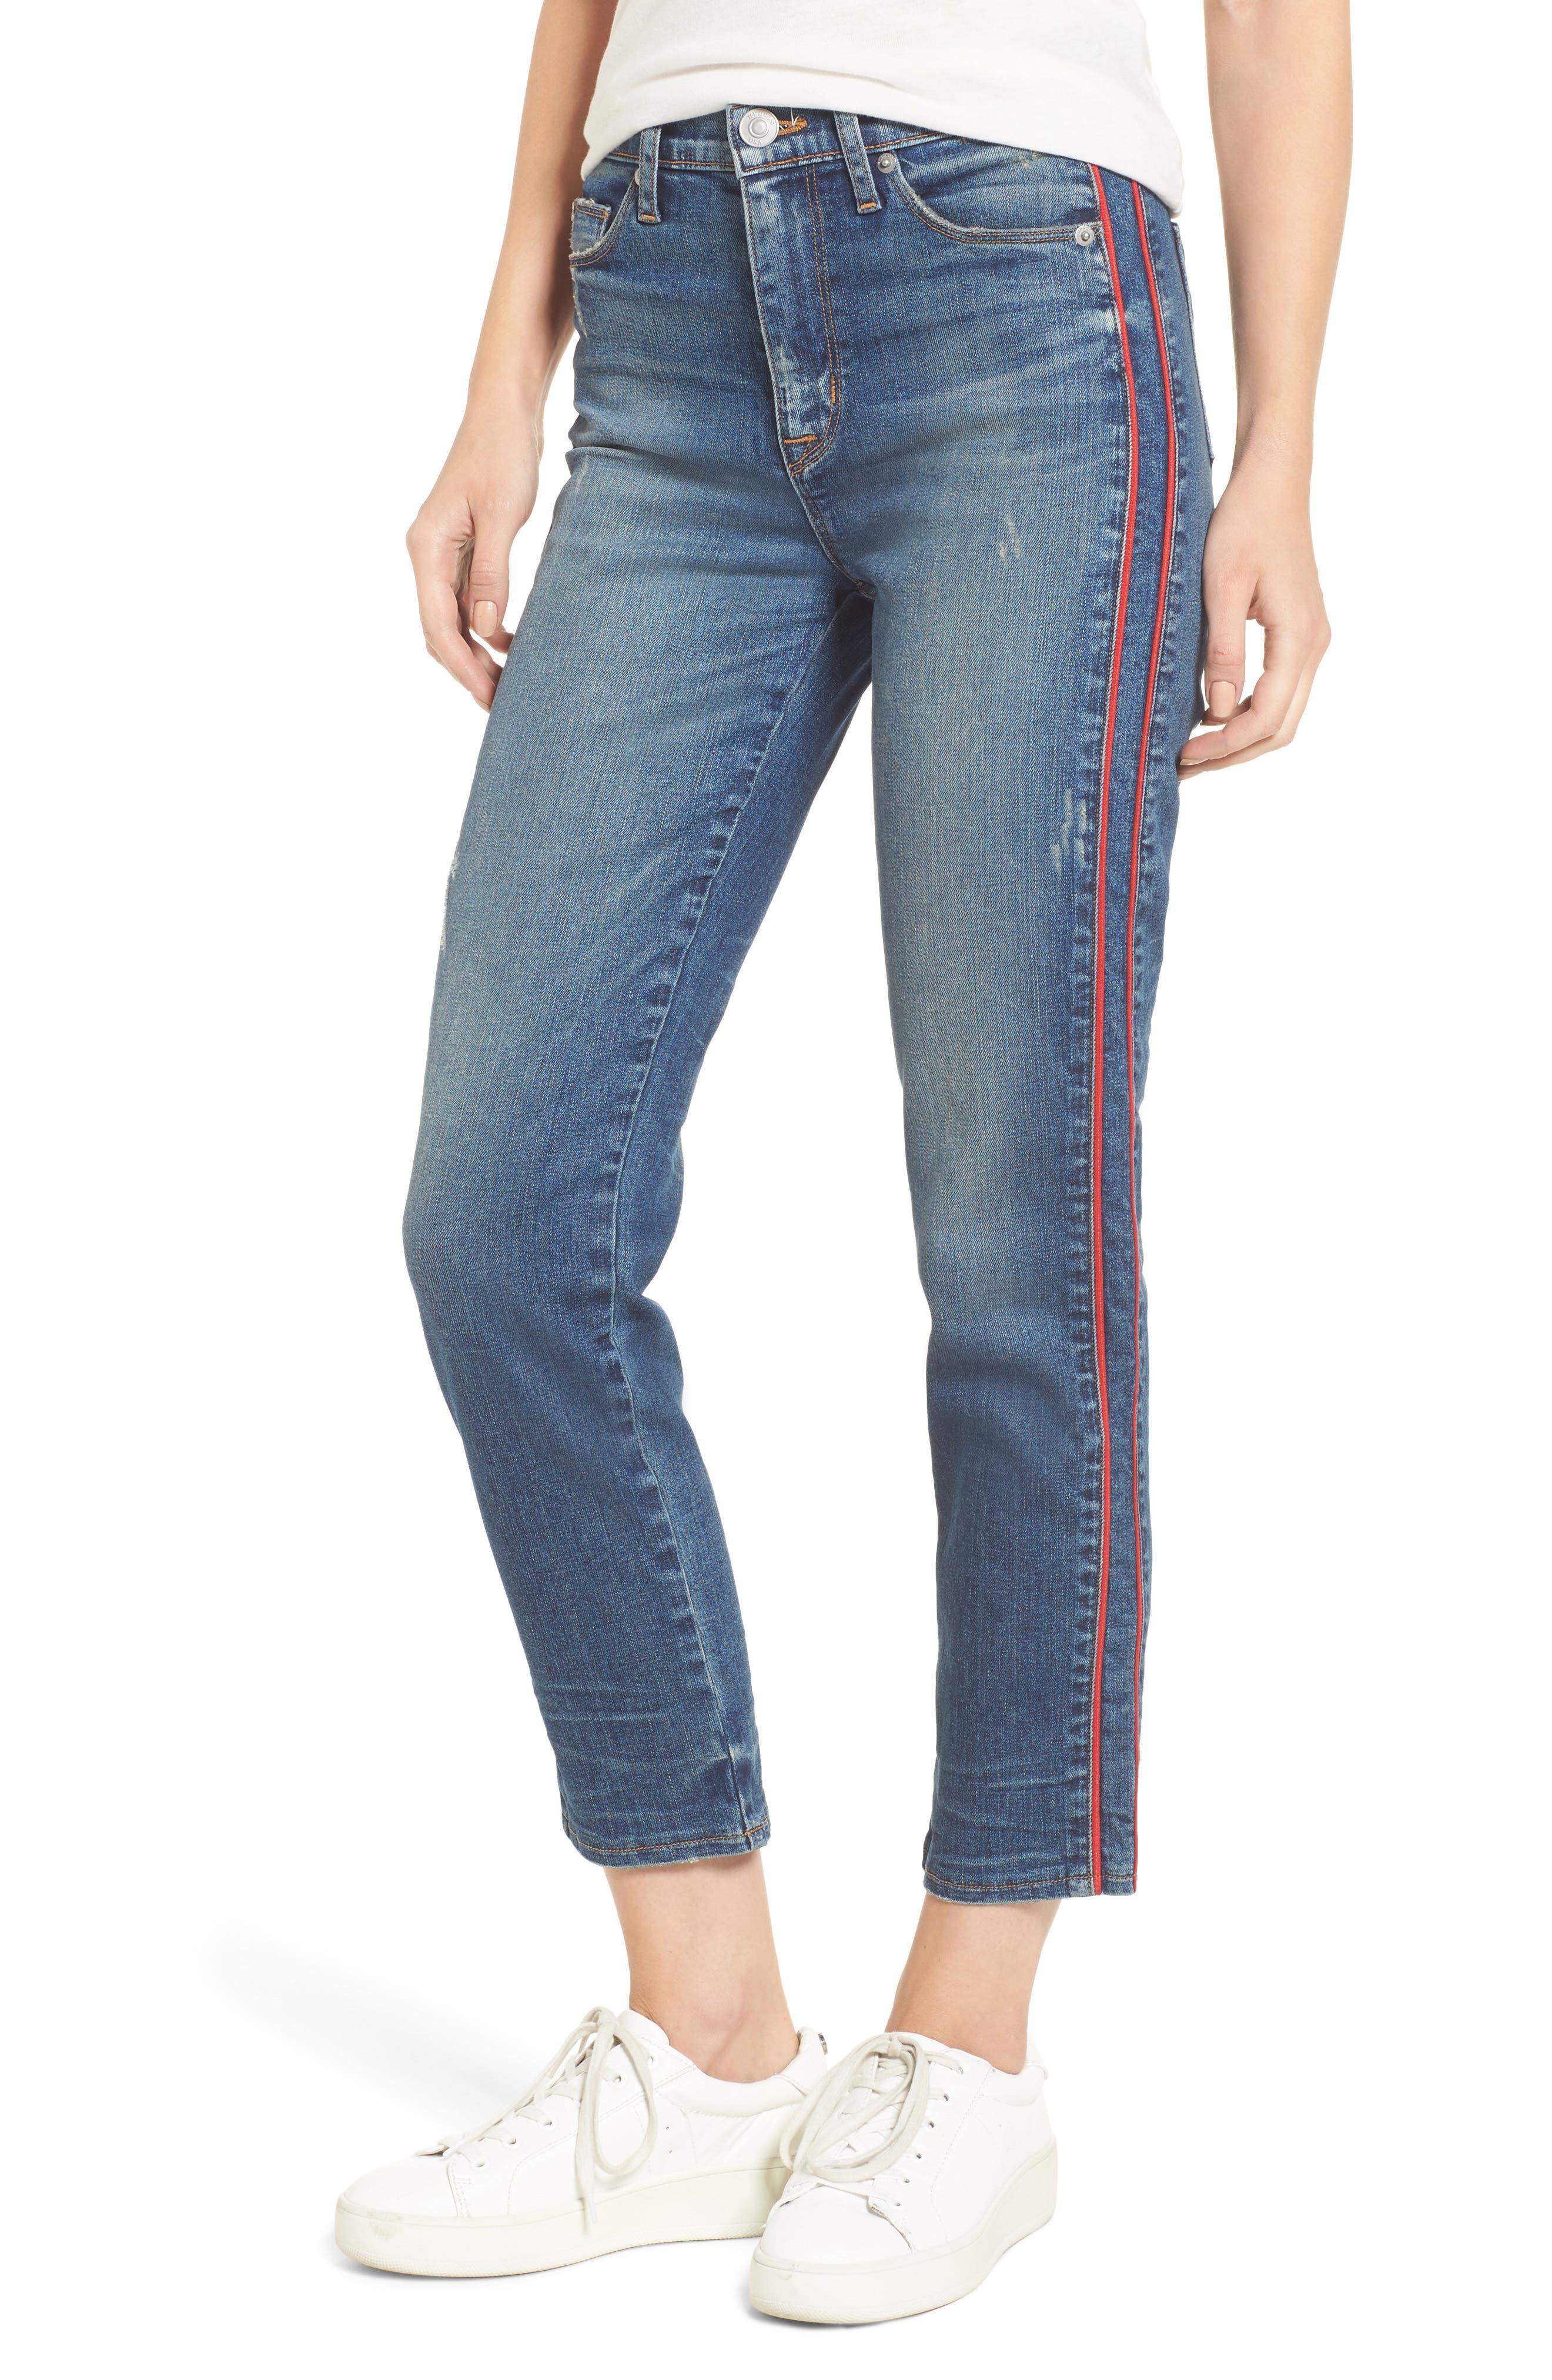 Zoeey High Waist Crop Jeans,                         Main,                         color, 460